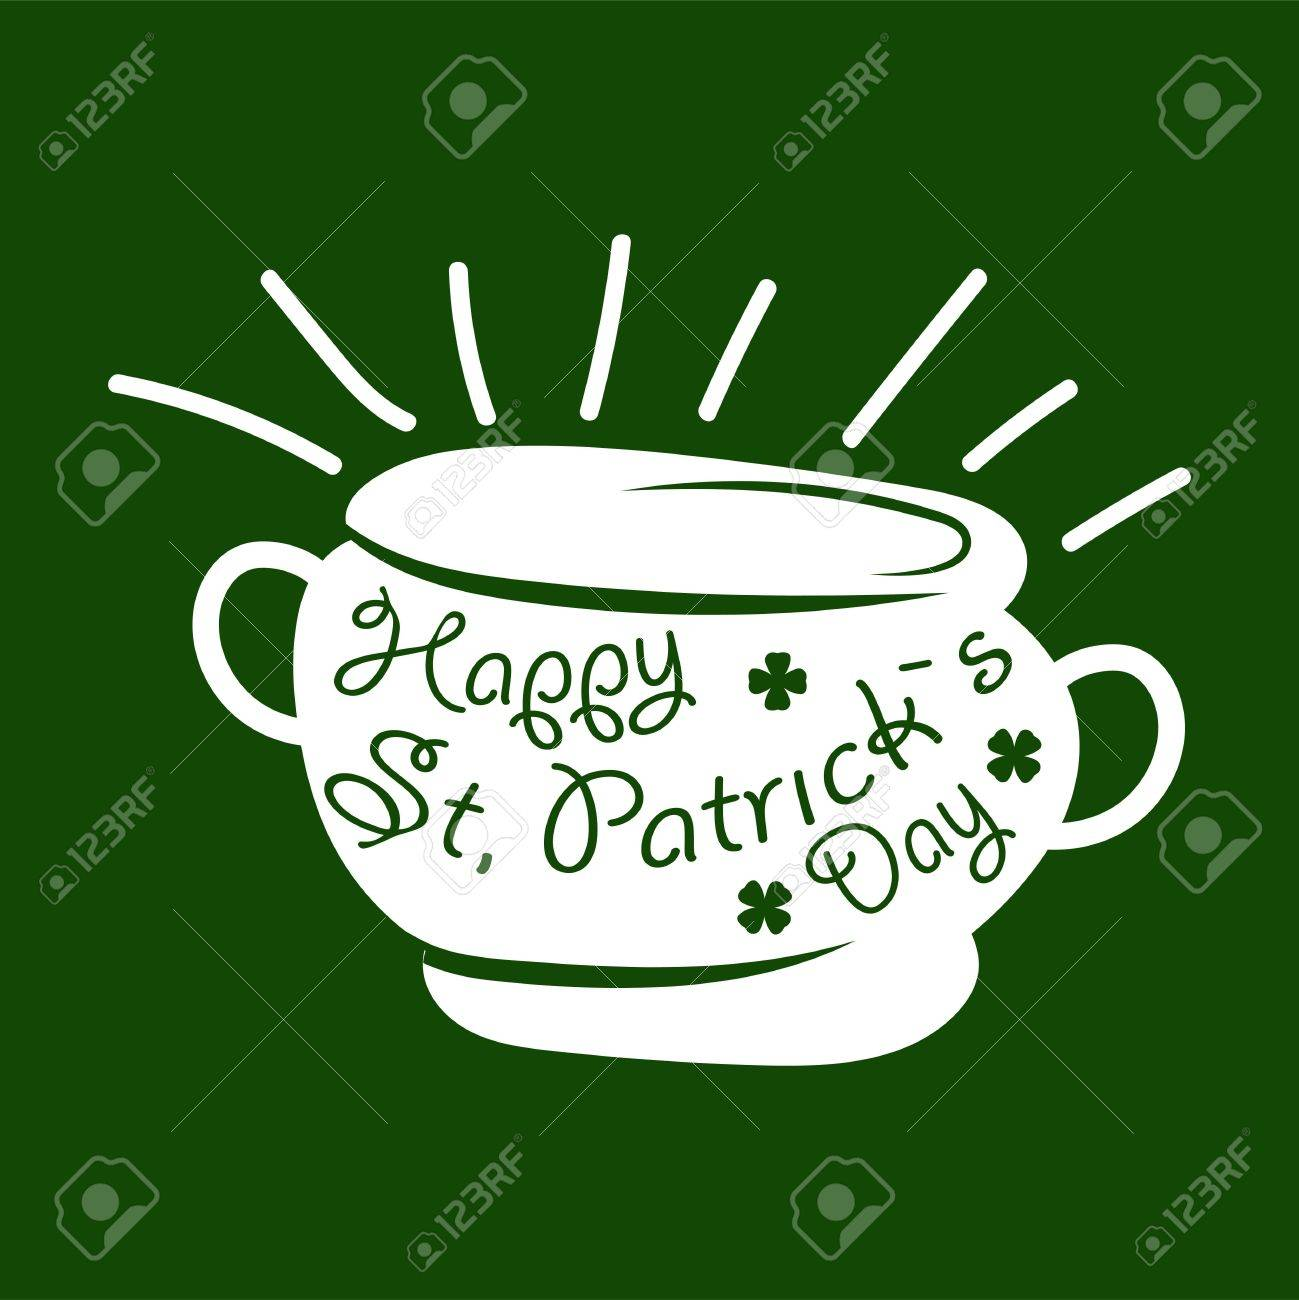 Saint patrick day symbol of leprechaun treasure pot and four leaf saint patrick day symbol of leprechaun treasure pot and four leaf clover leaf or lucky biocorpaavc